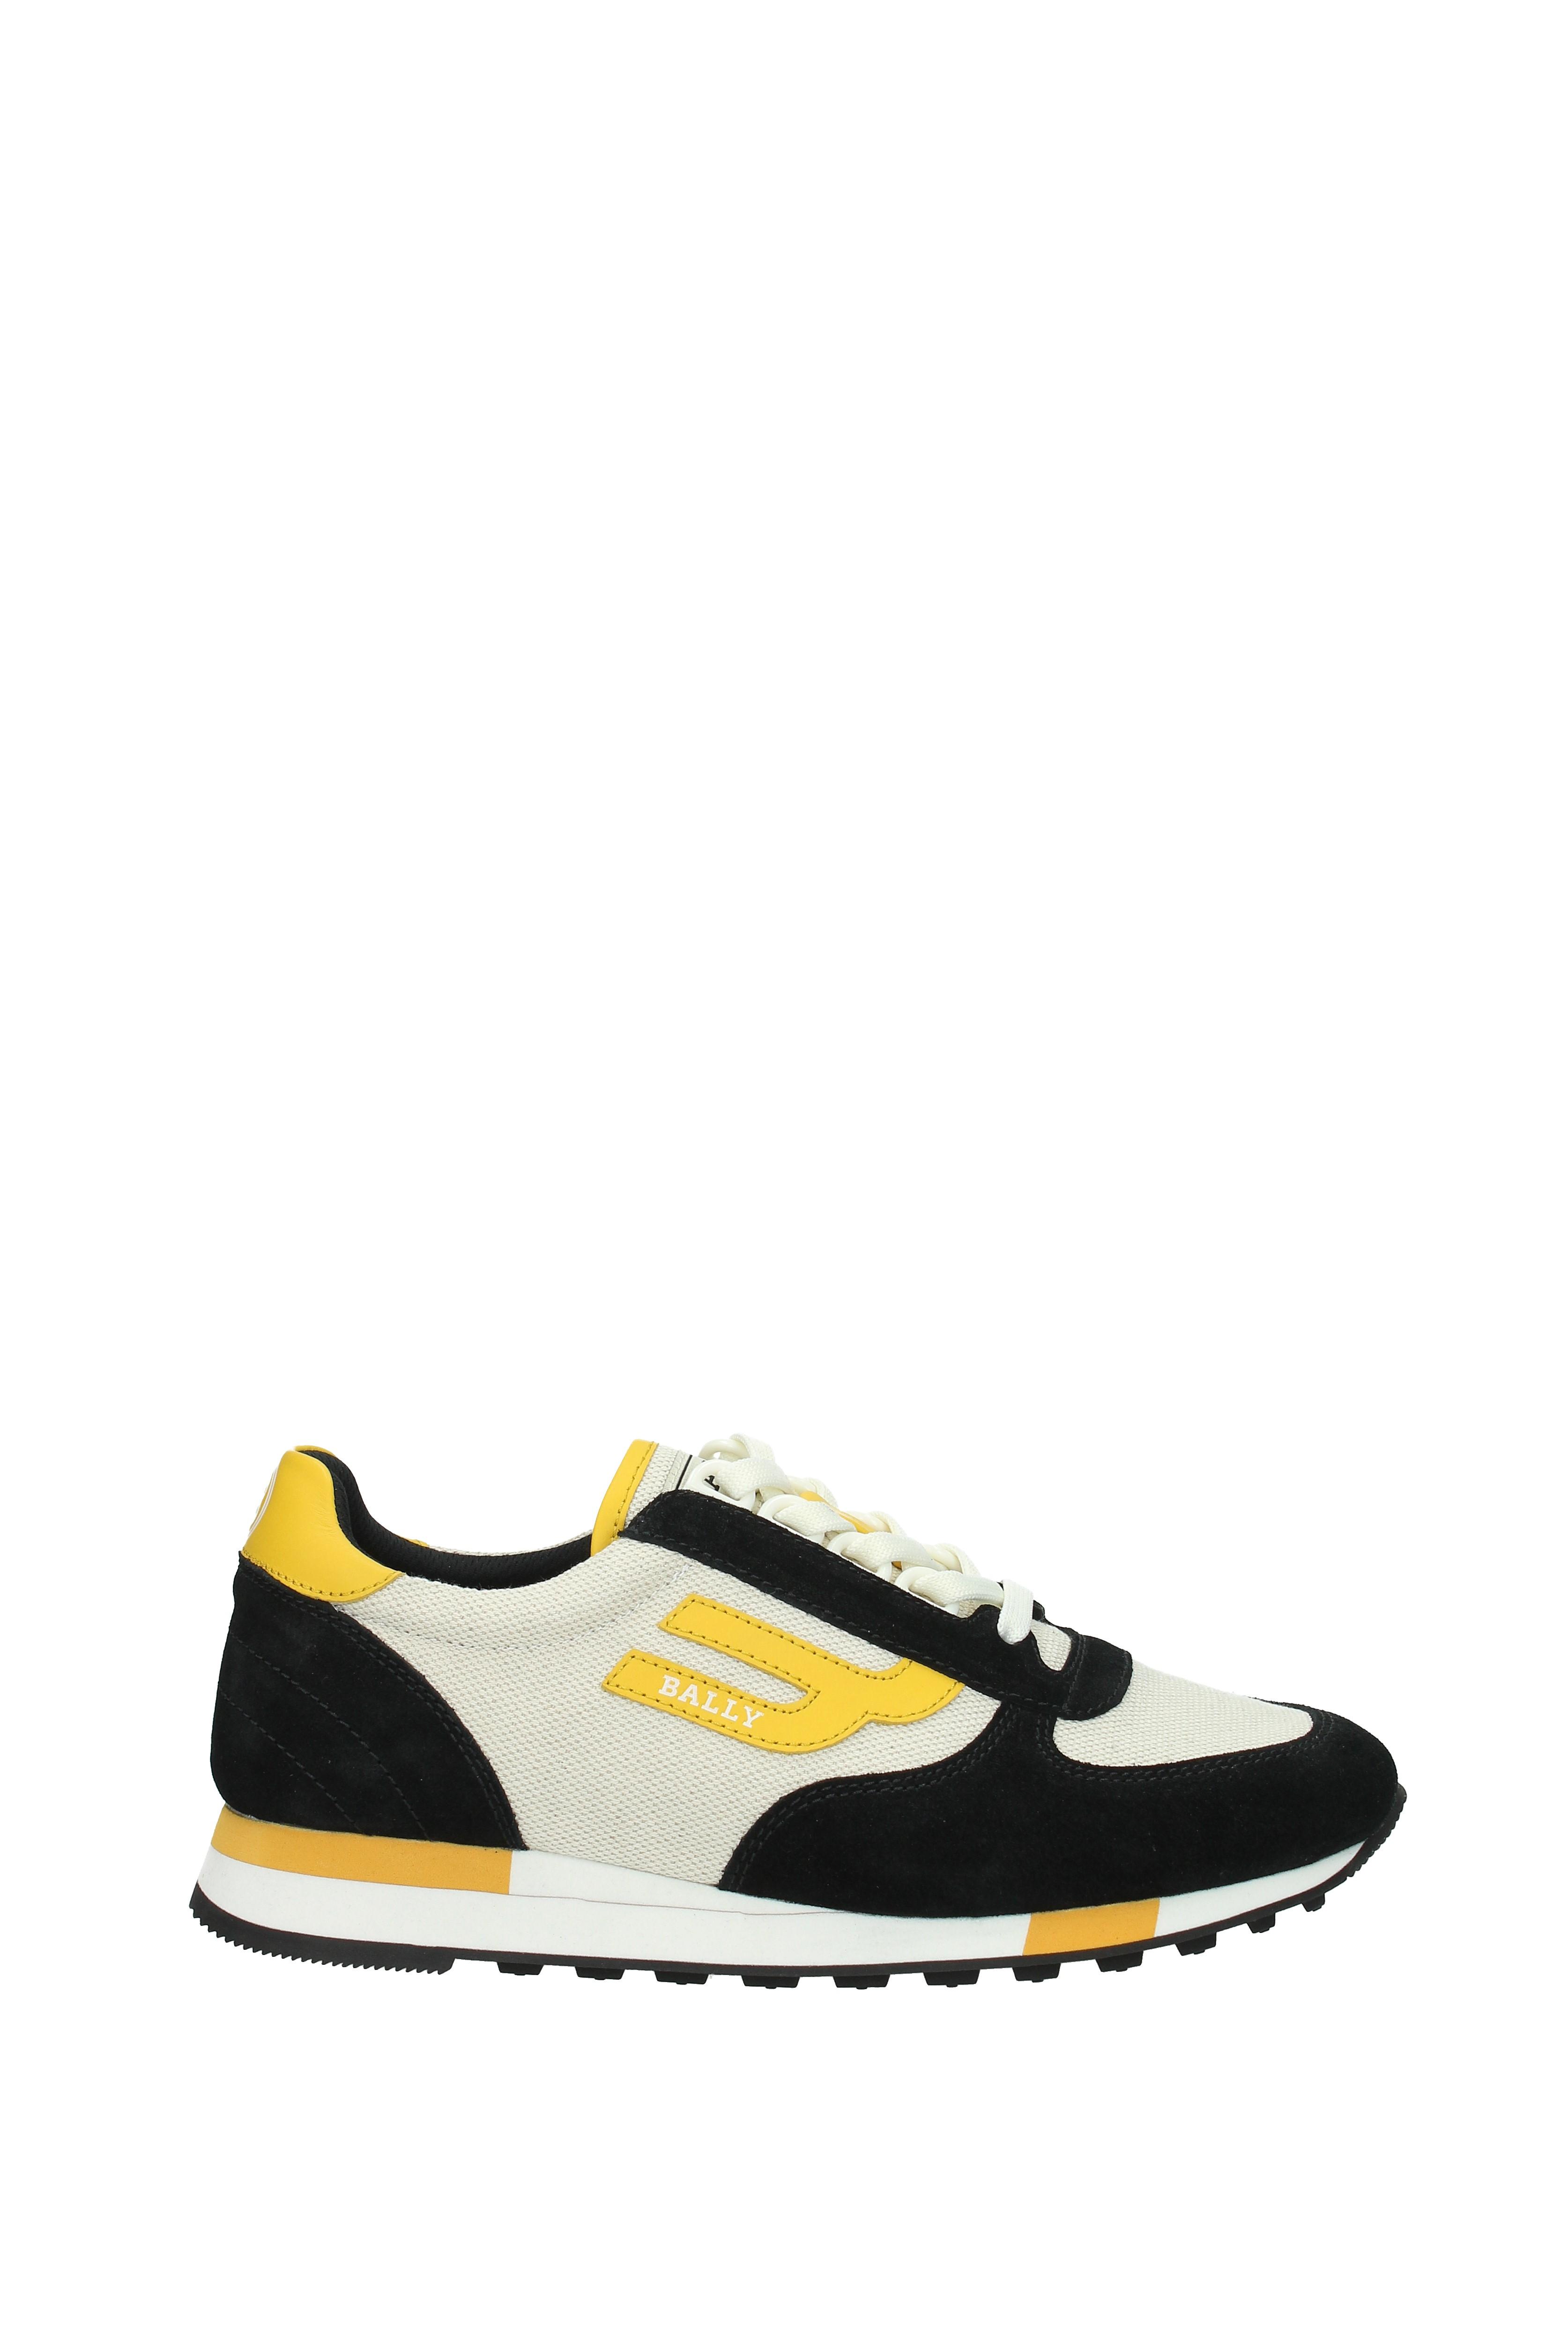 best loved 0e3a4 990cc ... NDS Nike AIR JORDAN 9 IX RETRO RETRO RETRO PREMIO  BIN23  410917-101 ...